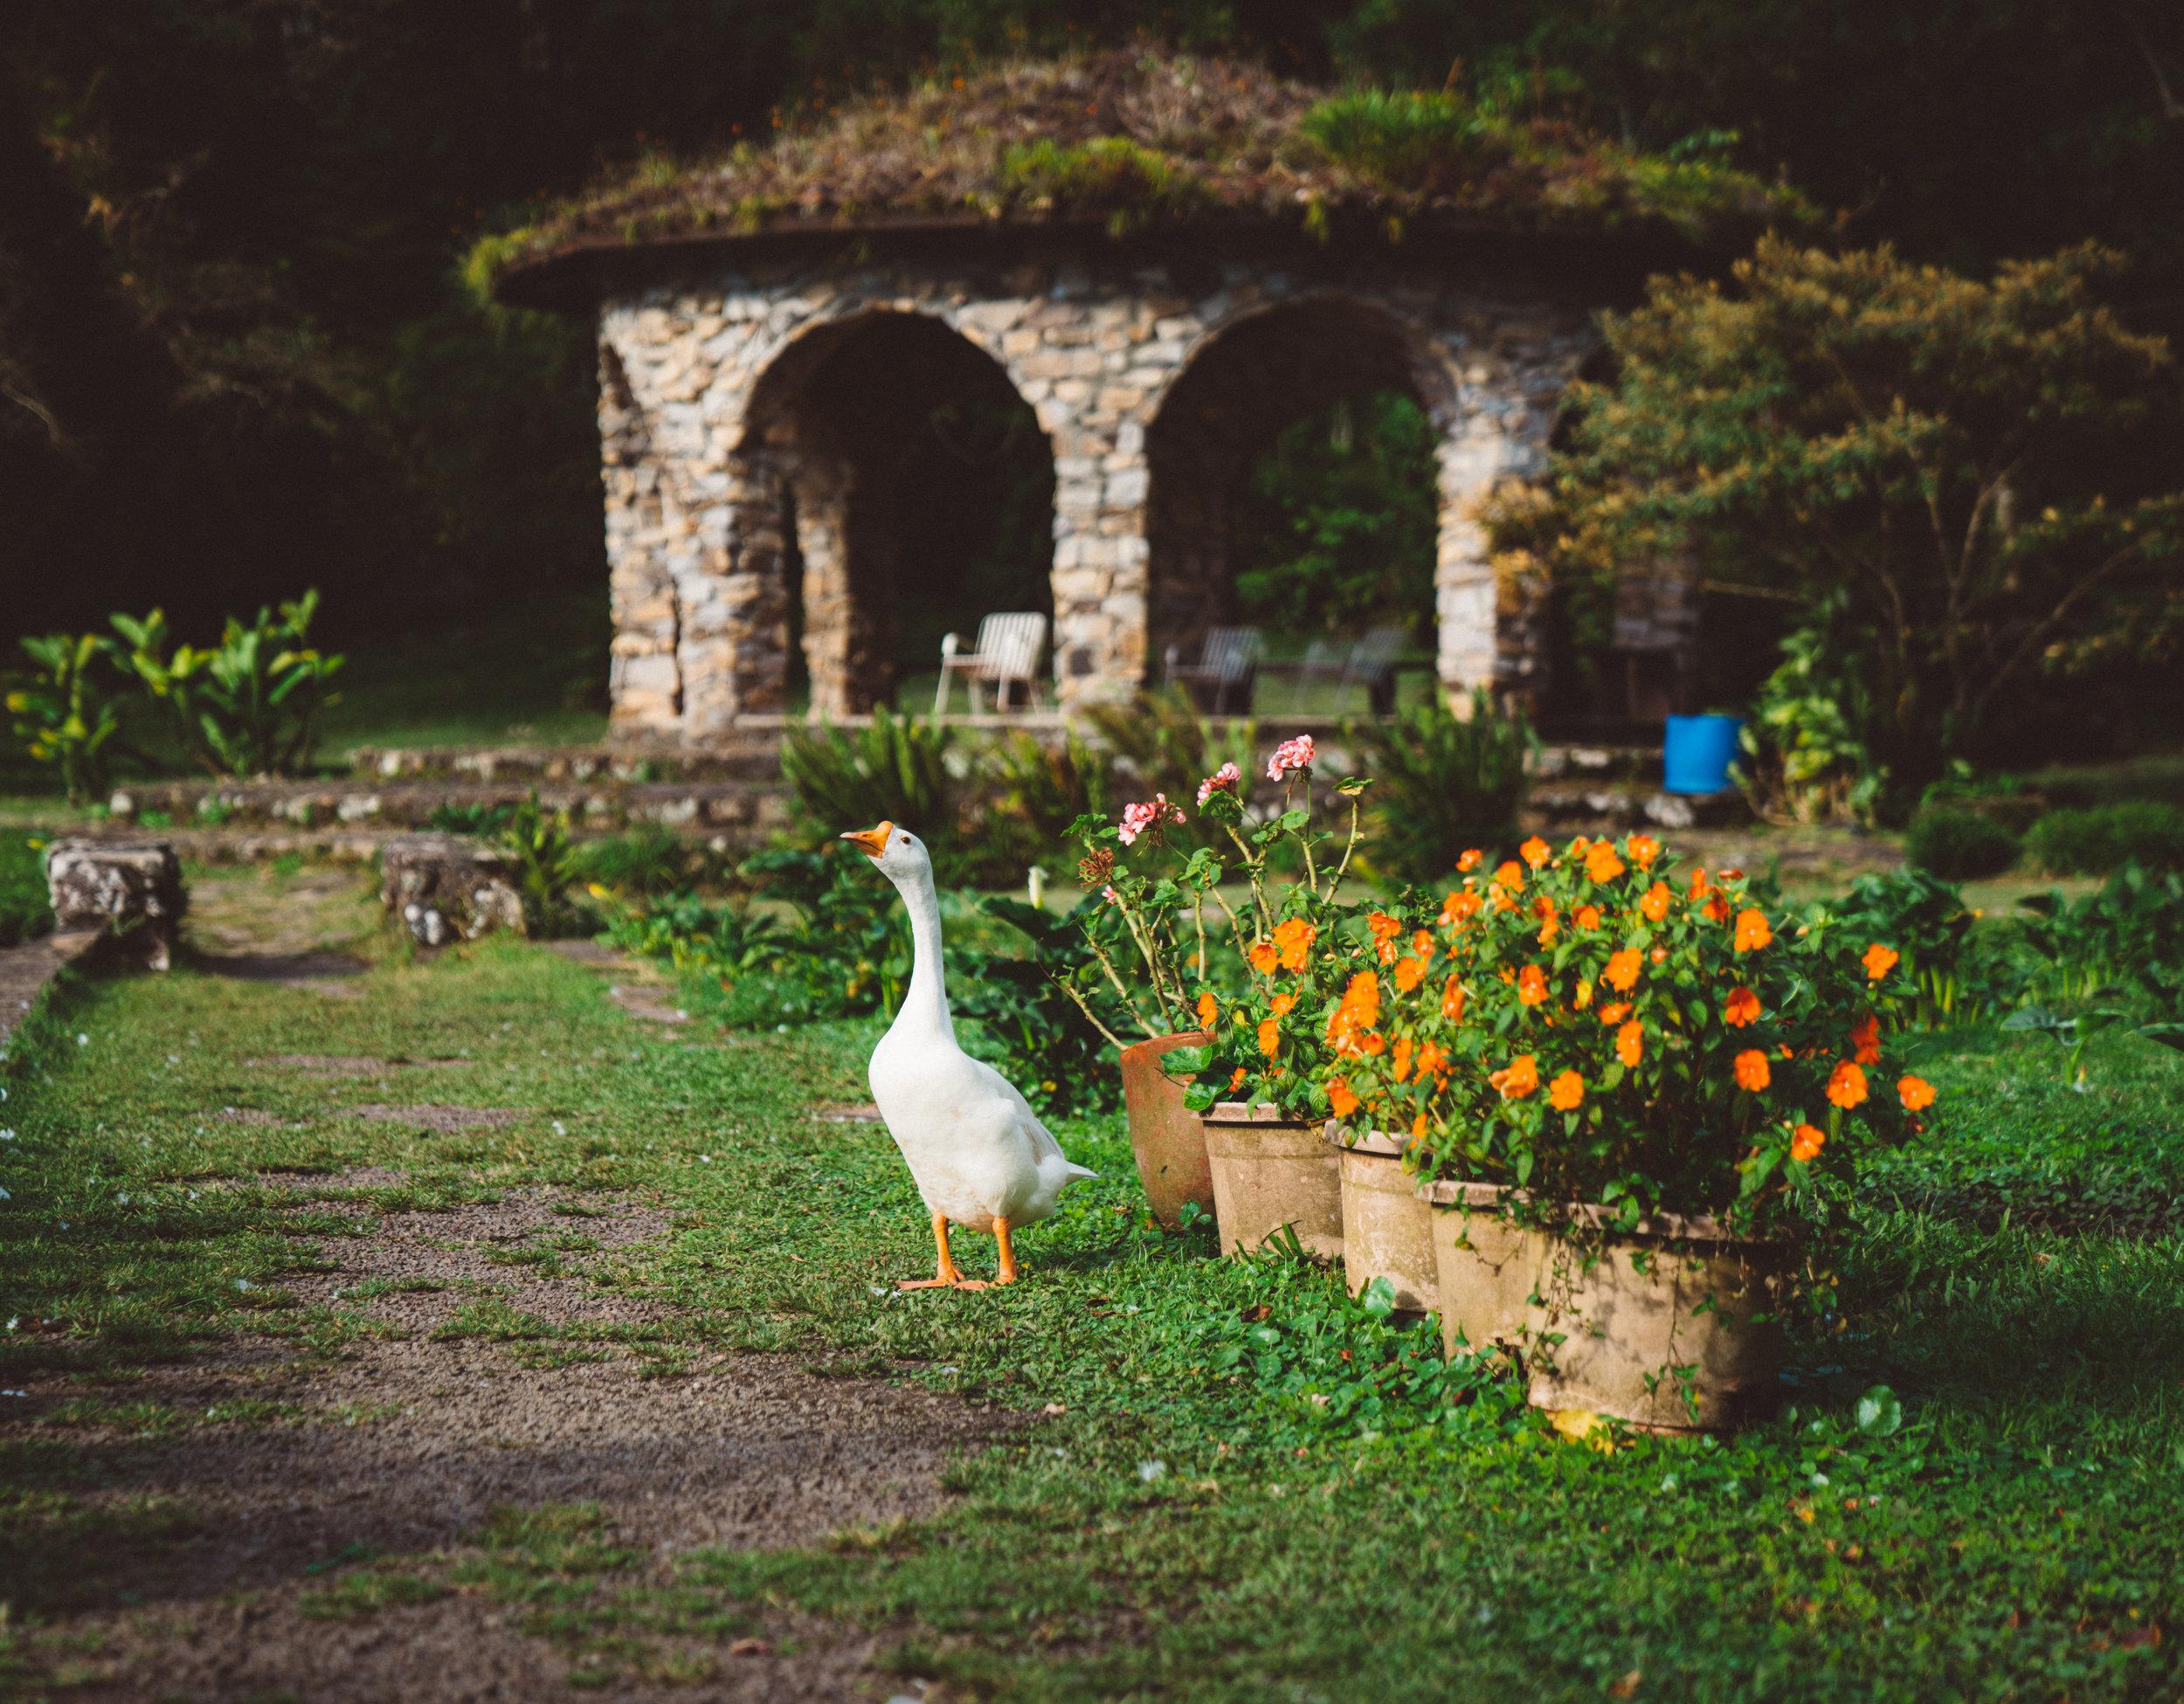 A very photogenic goose.